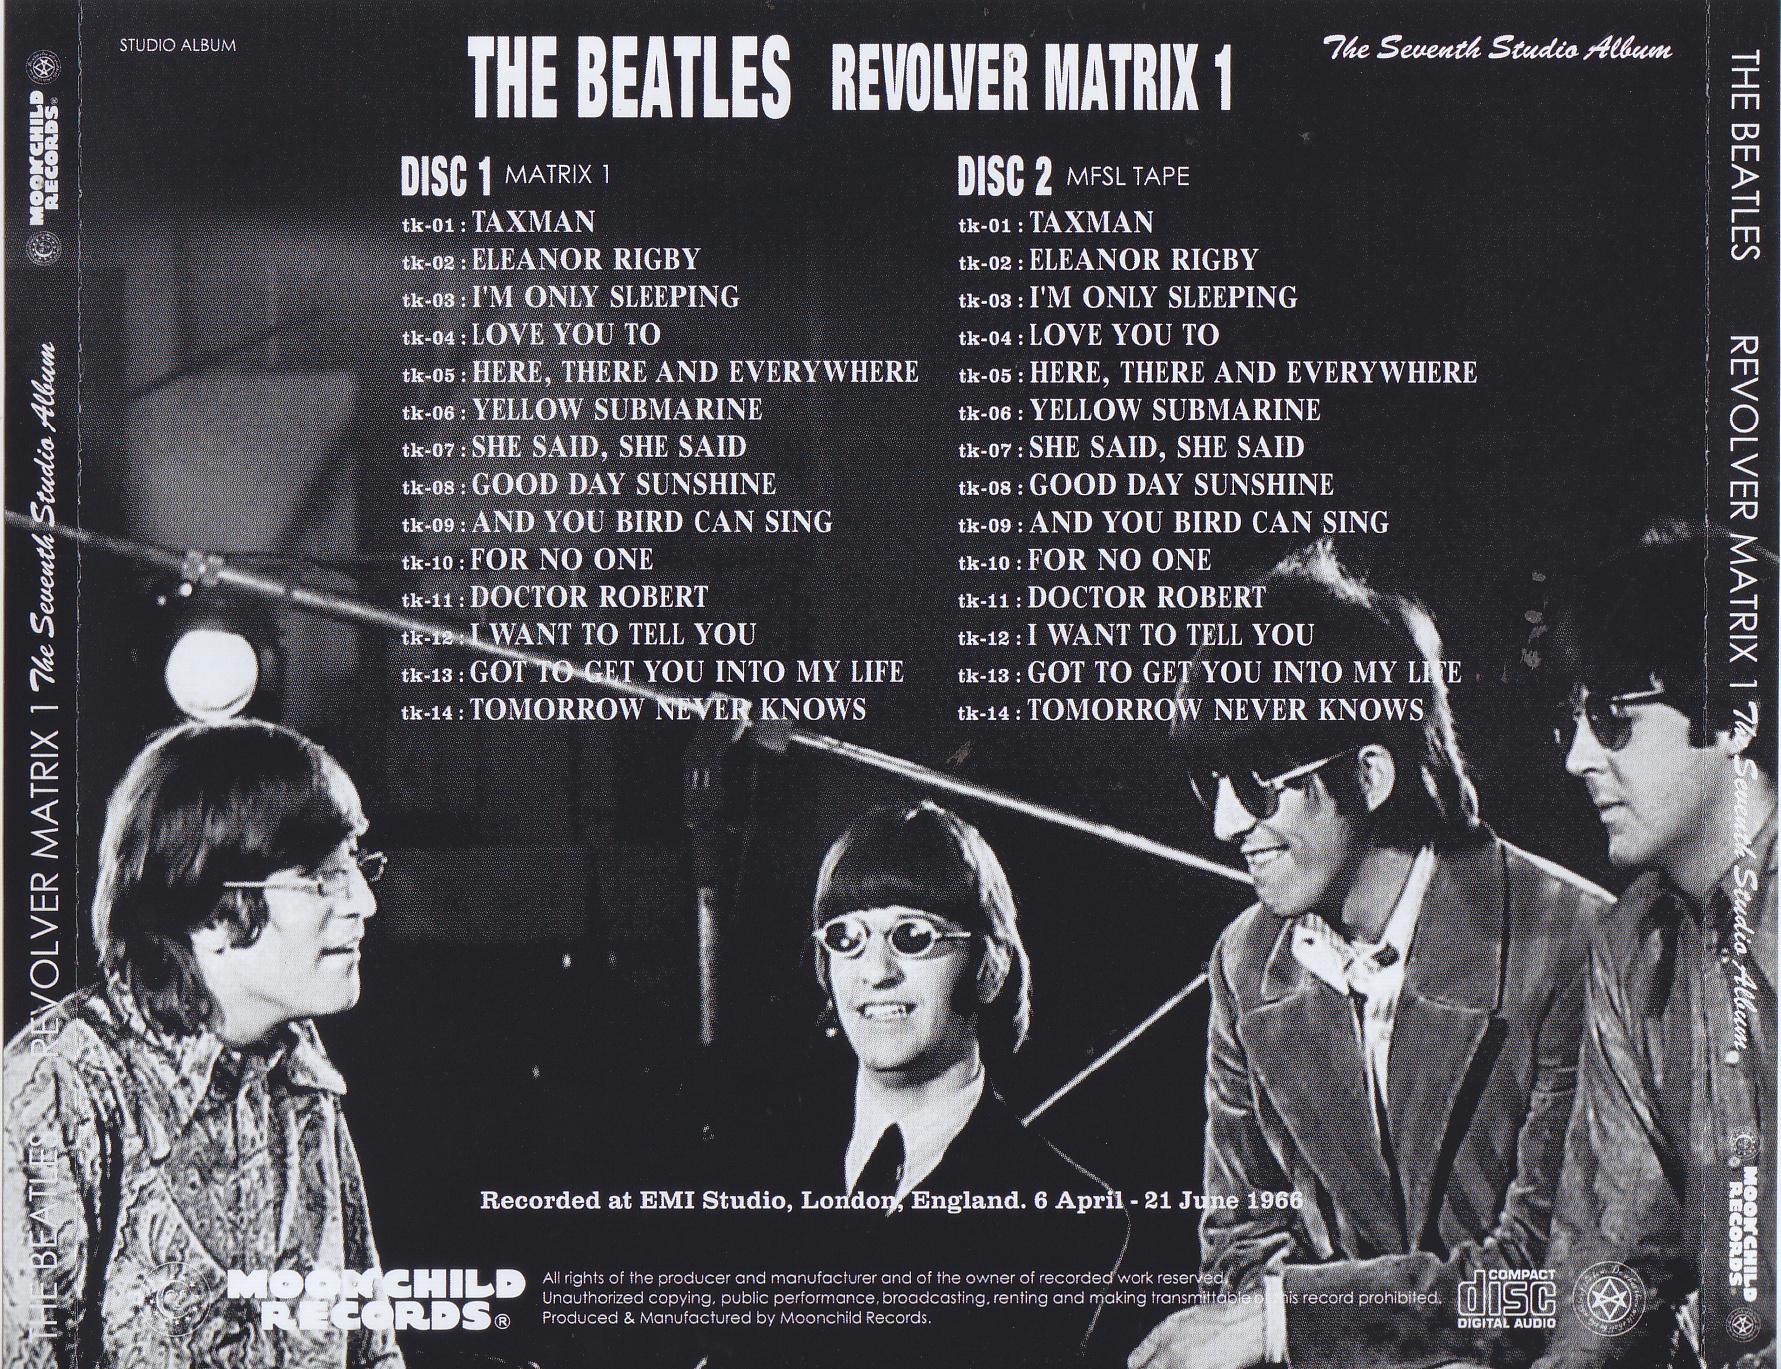 Beatles, The -Revolver Matrix 1 (2CD) Moonchild Records MC 084